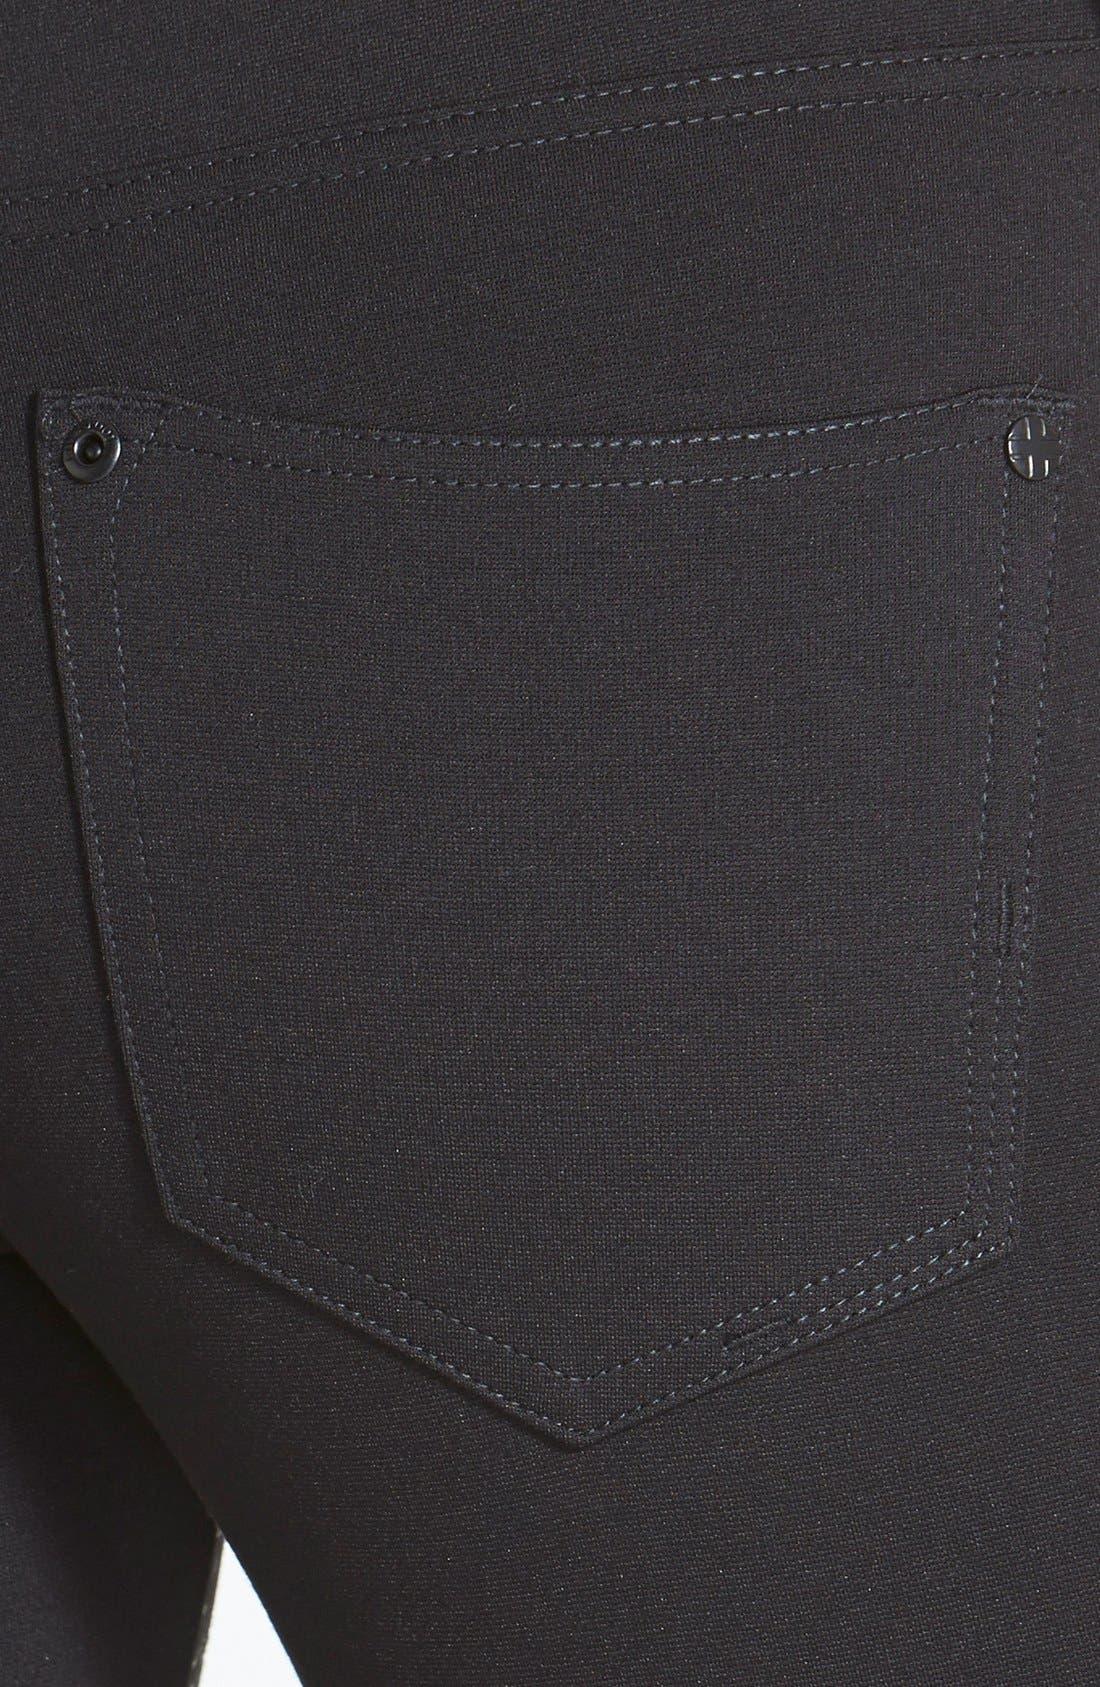 Alternate Image 3  - Liverpool Jeans Company 'Madonna' Gloss Print Stretch Knit Skinny Pants